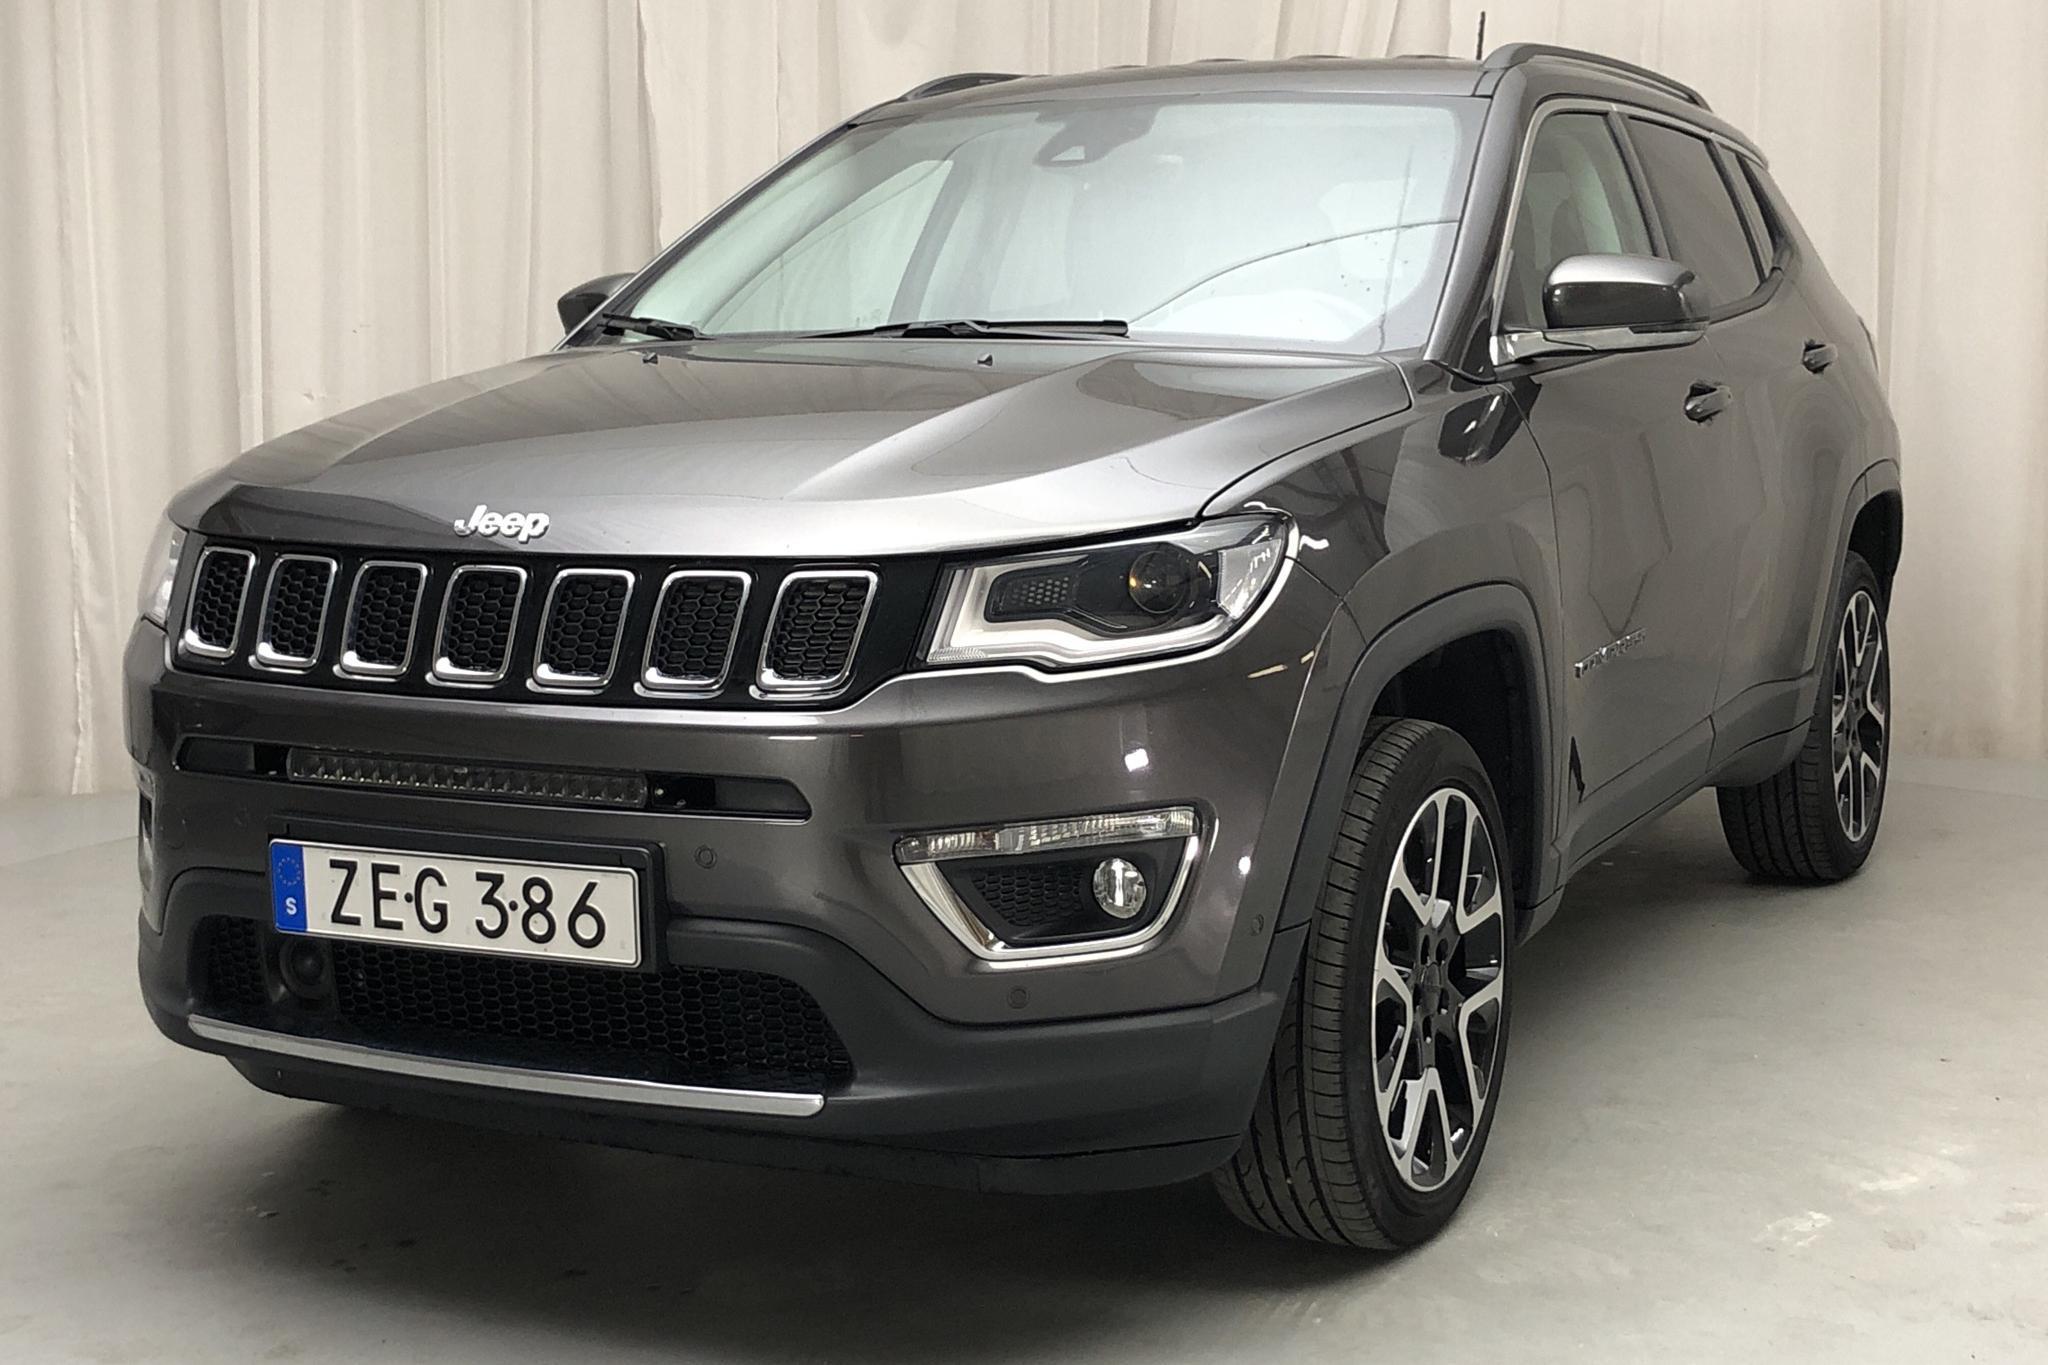 Jeep Compass 2.0 Multijet 4WD (170hk) - 57 400 km - Automatic - gray - 2018